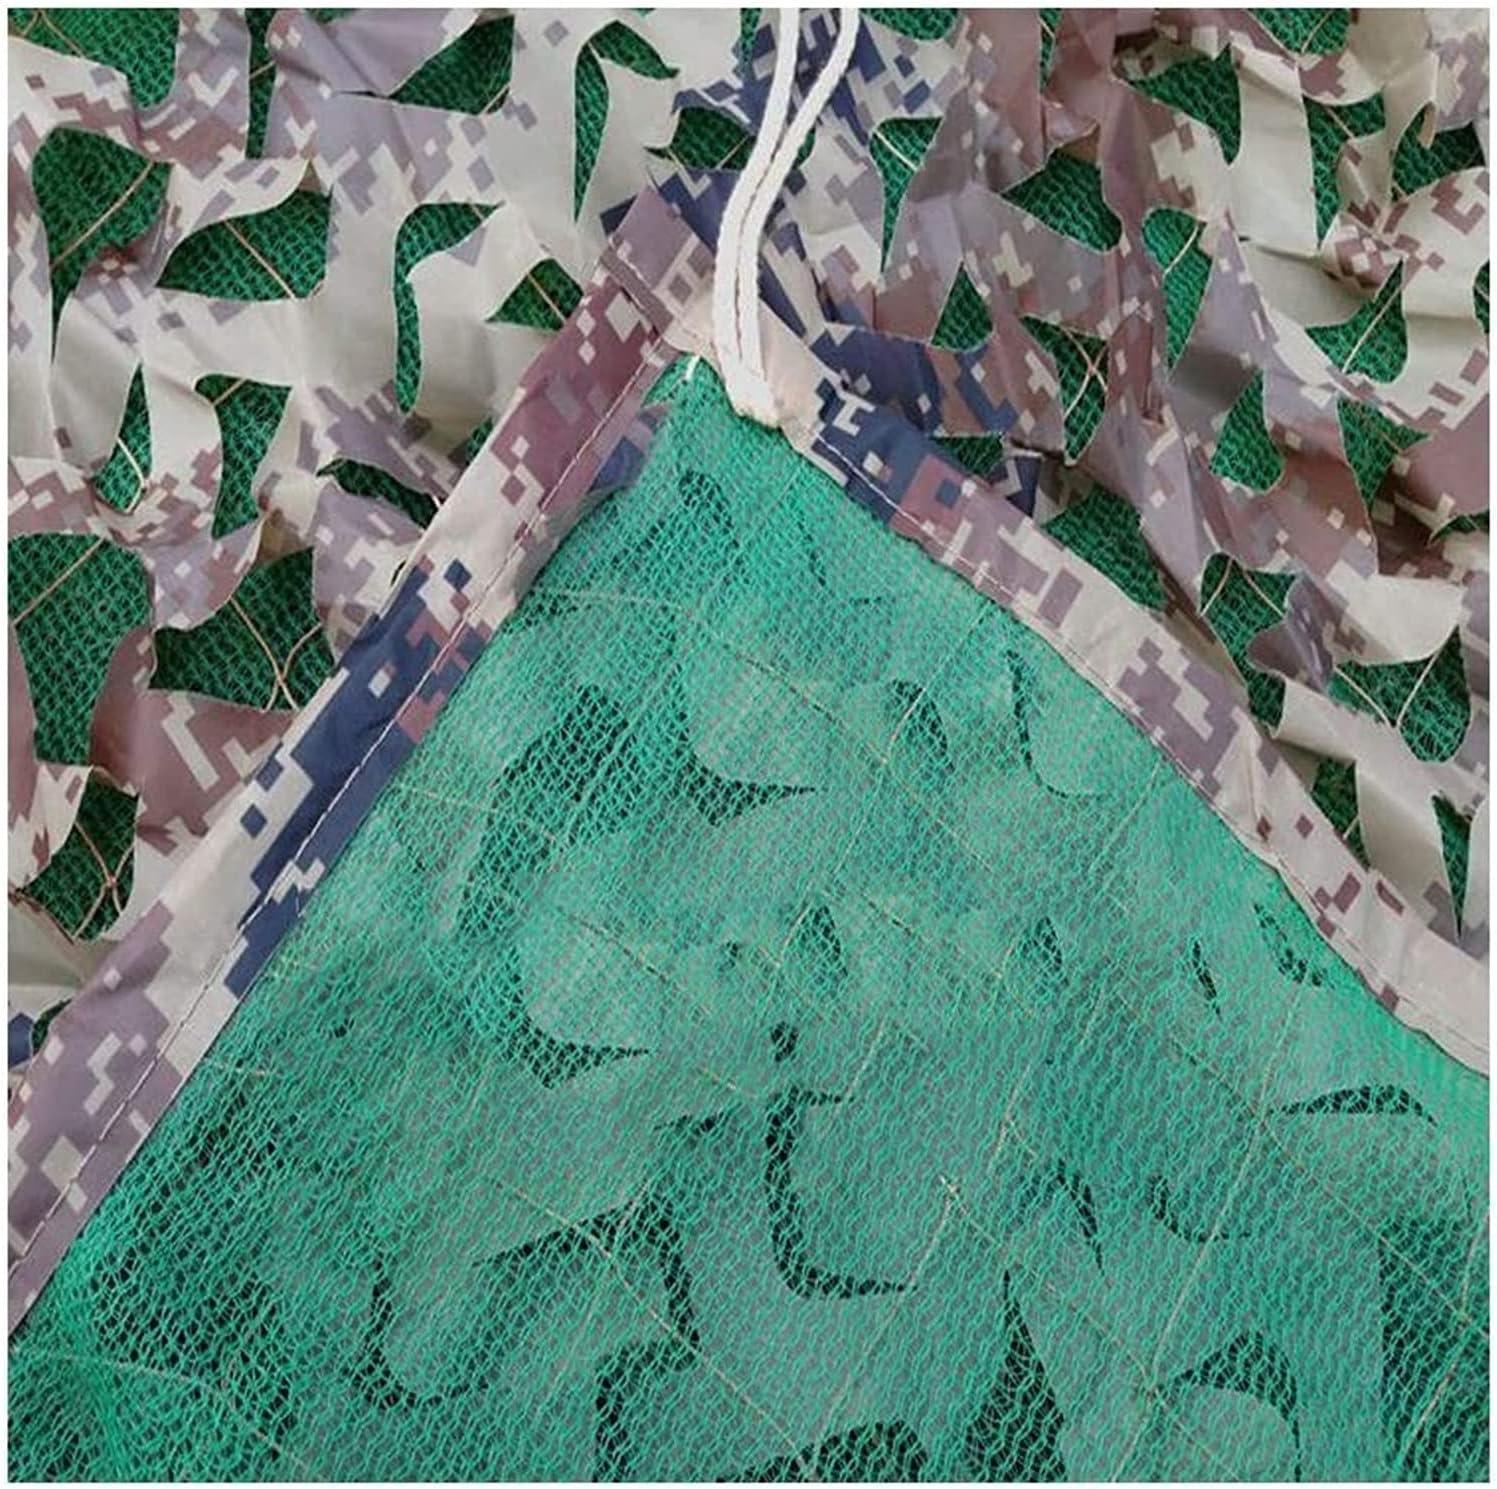 ZQDMBH Desert Net Awning Tarpaulin Boston Mall Netting Credence Woodland